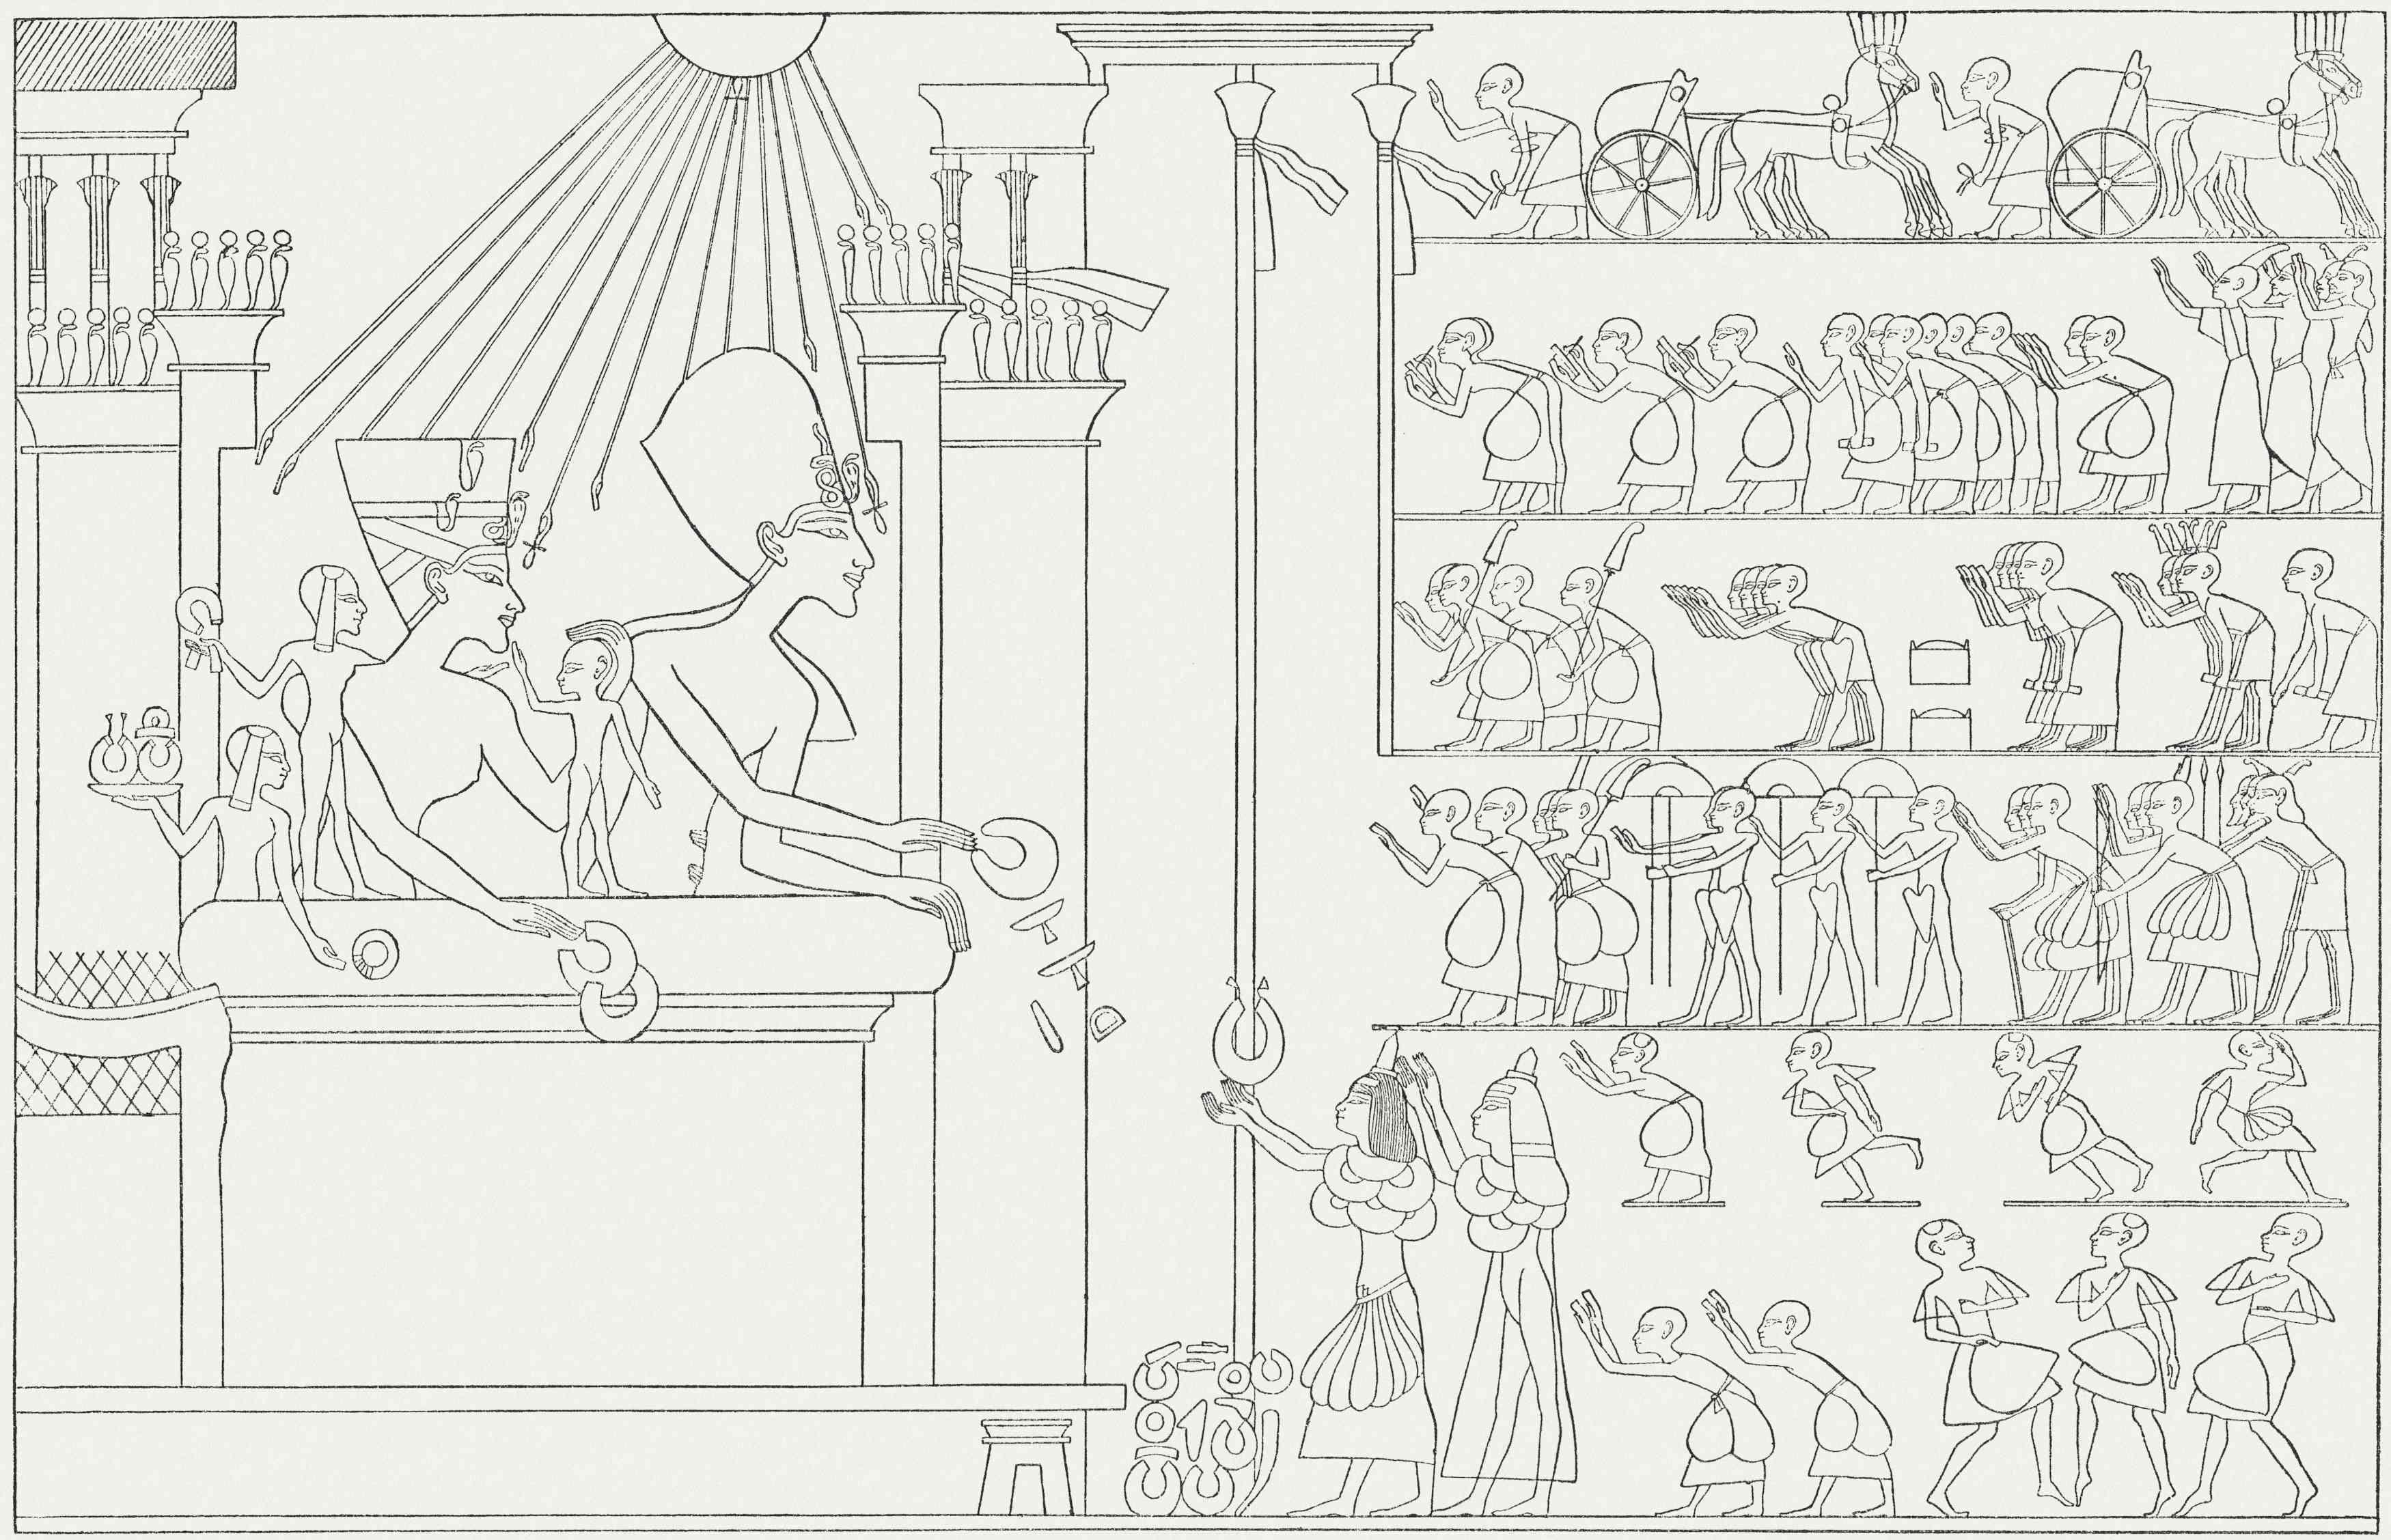 Akhenaten and Family Distributing Gifts